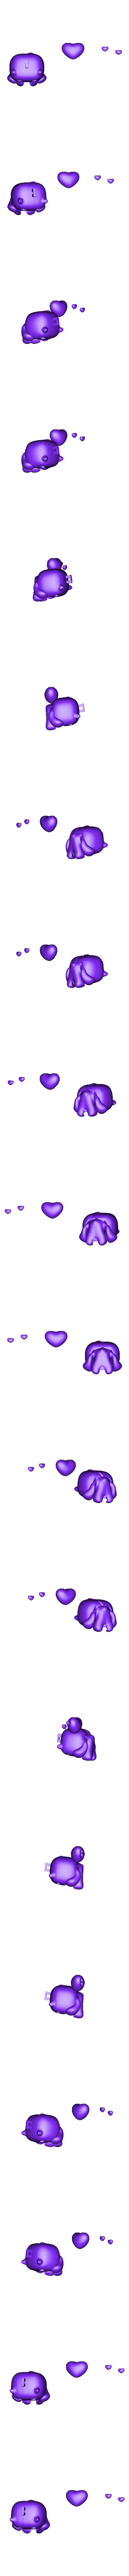 demoniobeb.stl Download free STL file devil baby FUNKO necklace and ring . funkos colgante bebe demonio y anillo a juego. #ANYCUBIC3D • 3D printing object, gaaraa